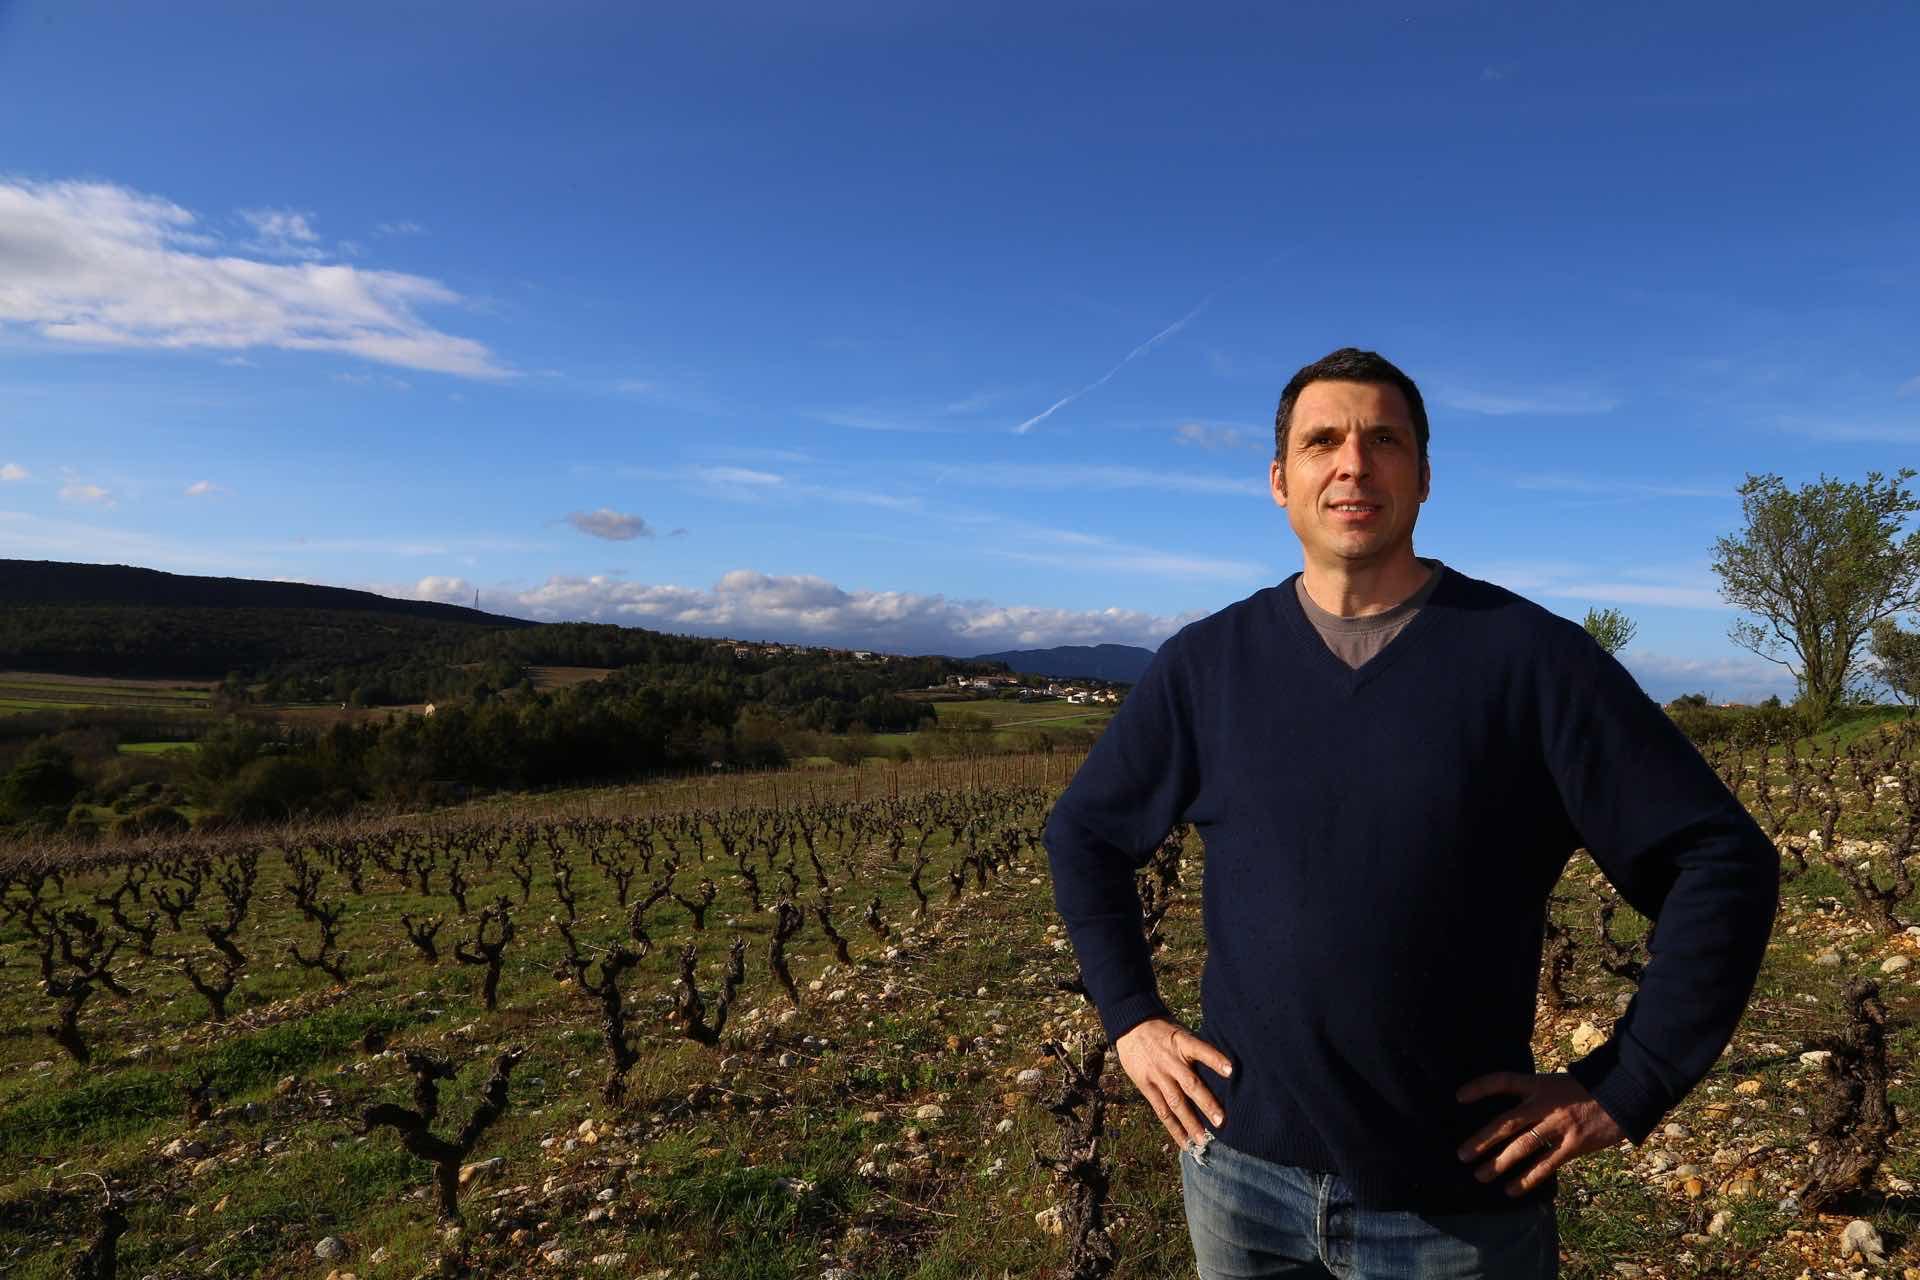 Domaine du Chemin des Rêves - アペロ ワインバー オーガニックワインxフランス家庭料理 - 東京都港区南青山3-4-6 / apéro WINEBAR - vins et petits plats français